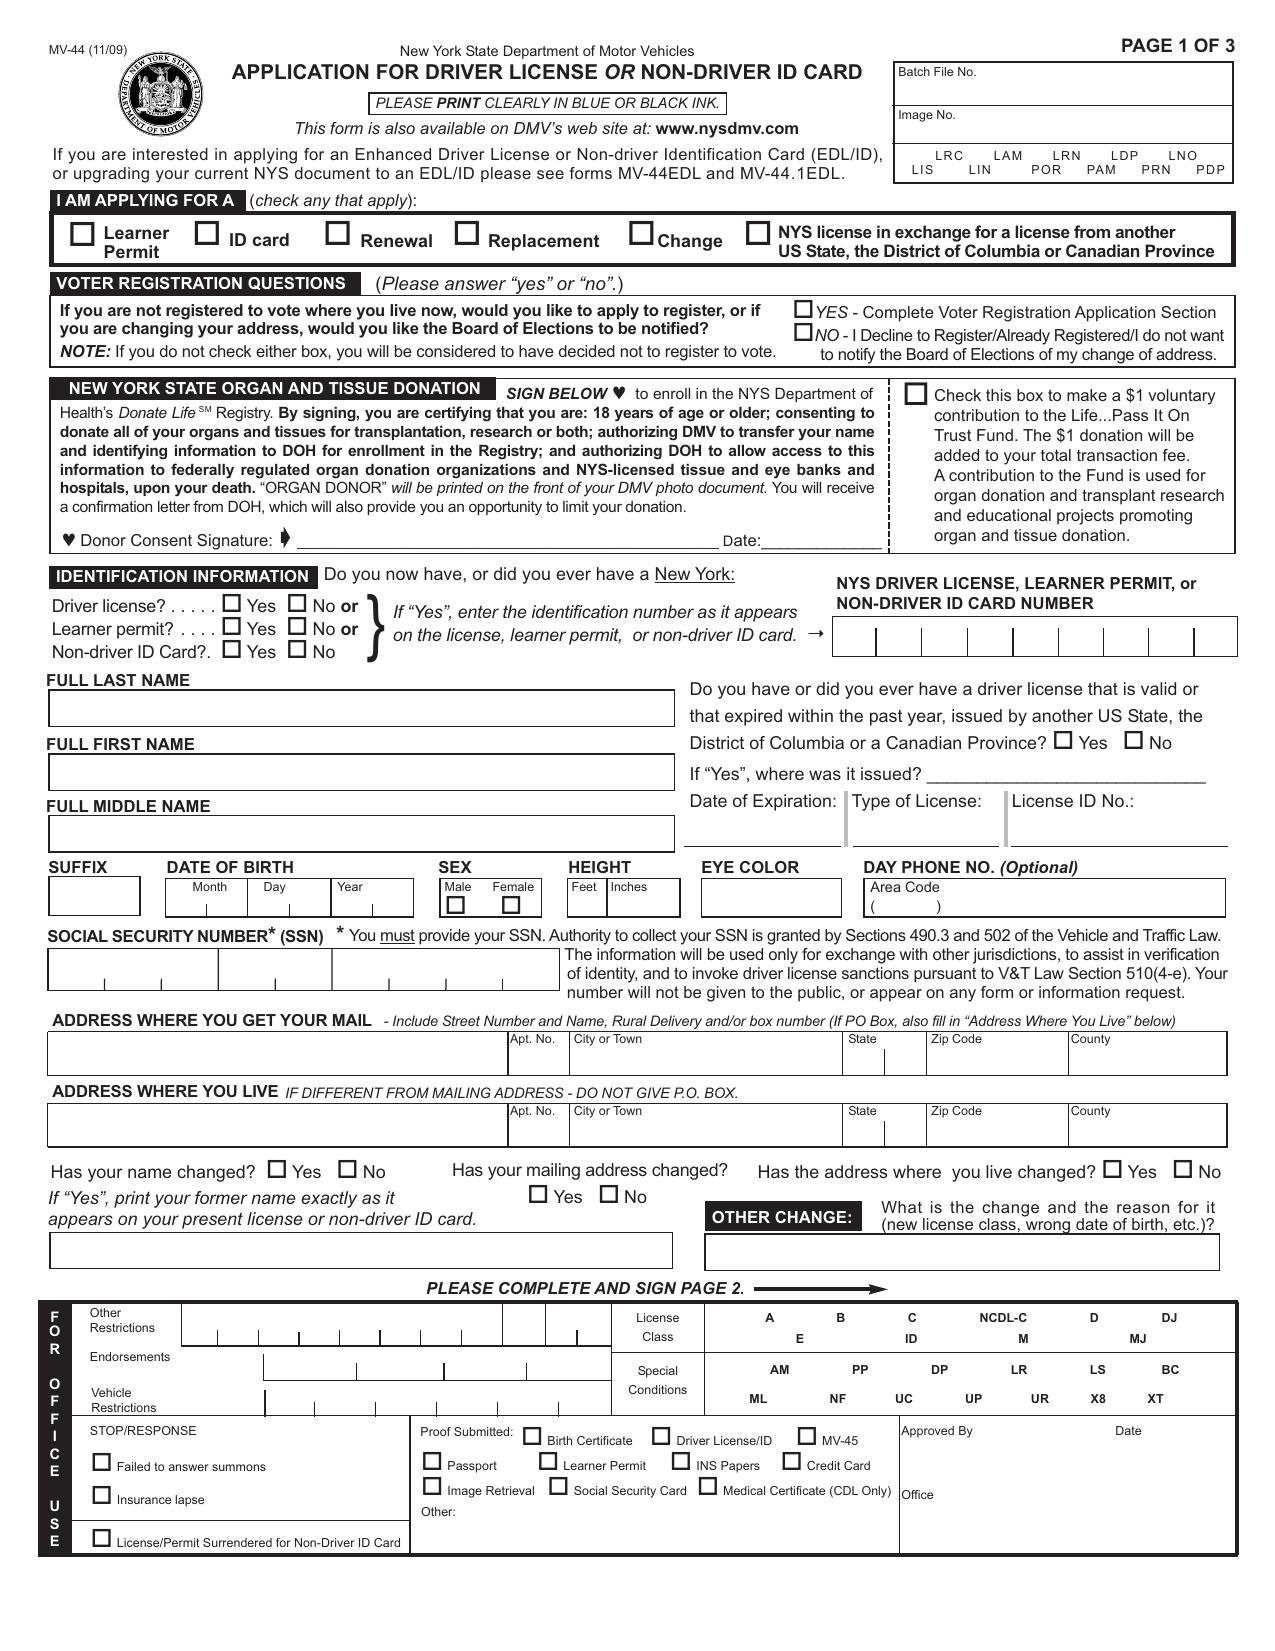 Application For License Driver mv-44